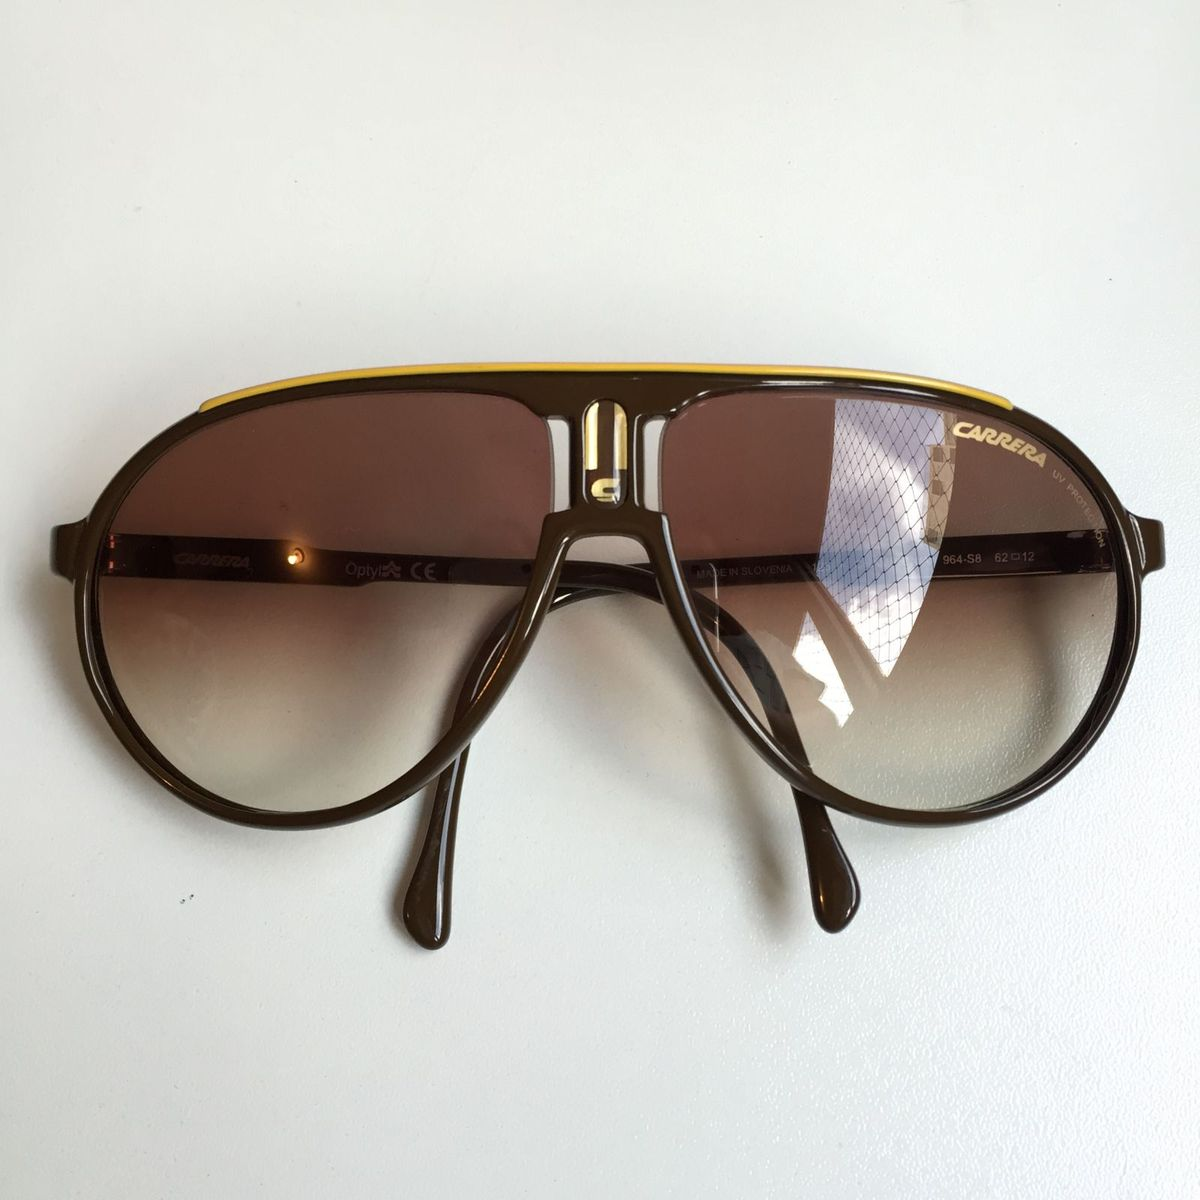 72a735d1c3281 óculos carrera champion - óculos carrera.  Czm6ly9wag90b3muzw5qb2vplmnvbs5ici9wcm9kdwn0cy8xmdkxmtuvytqzmtg1y2m5mtk5otuymjcxmjzimgmyyjg0mmnknzauanbn  ...